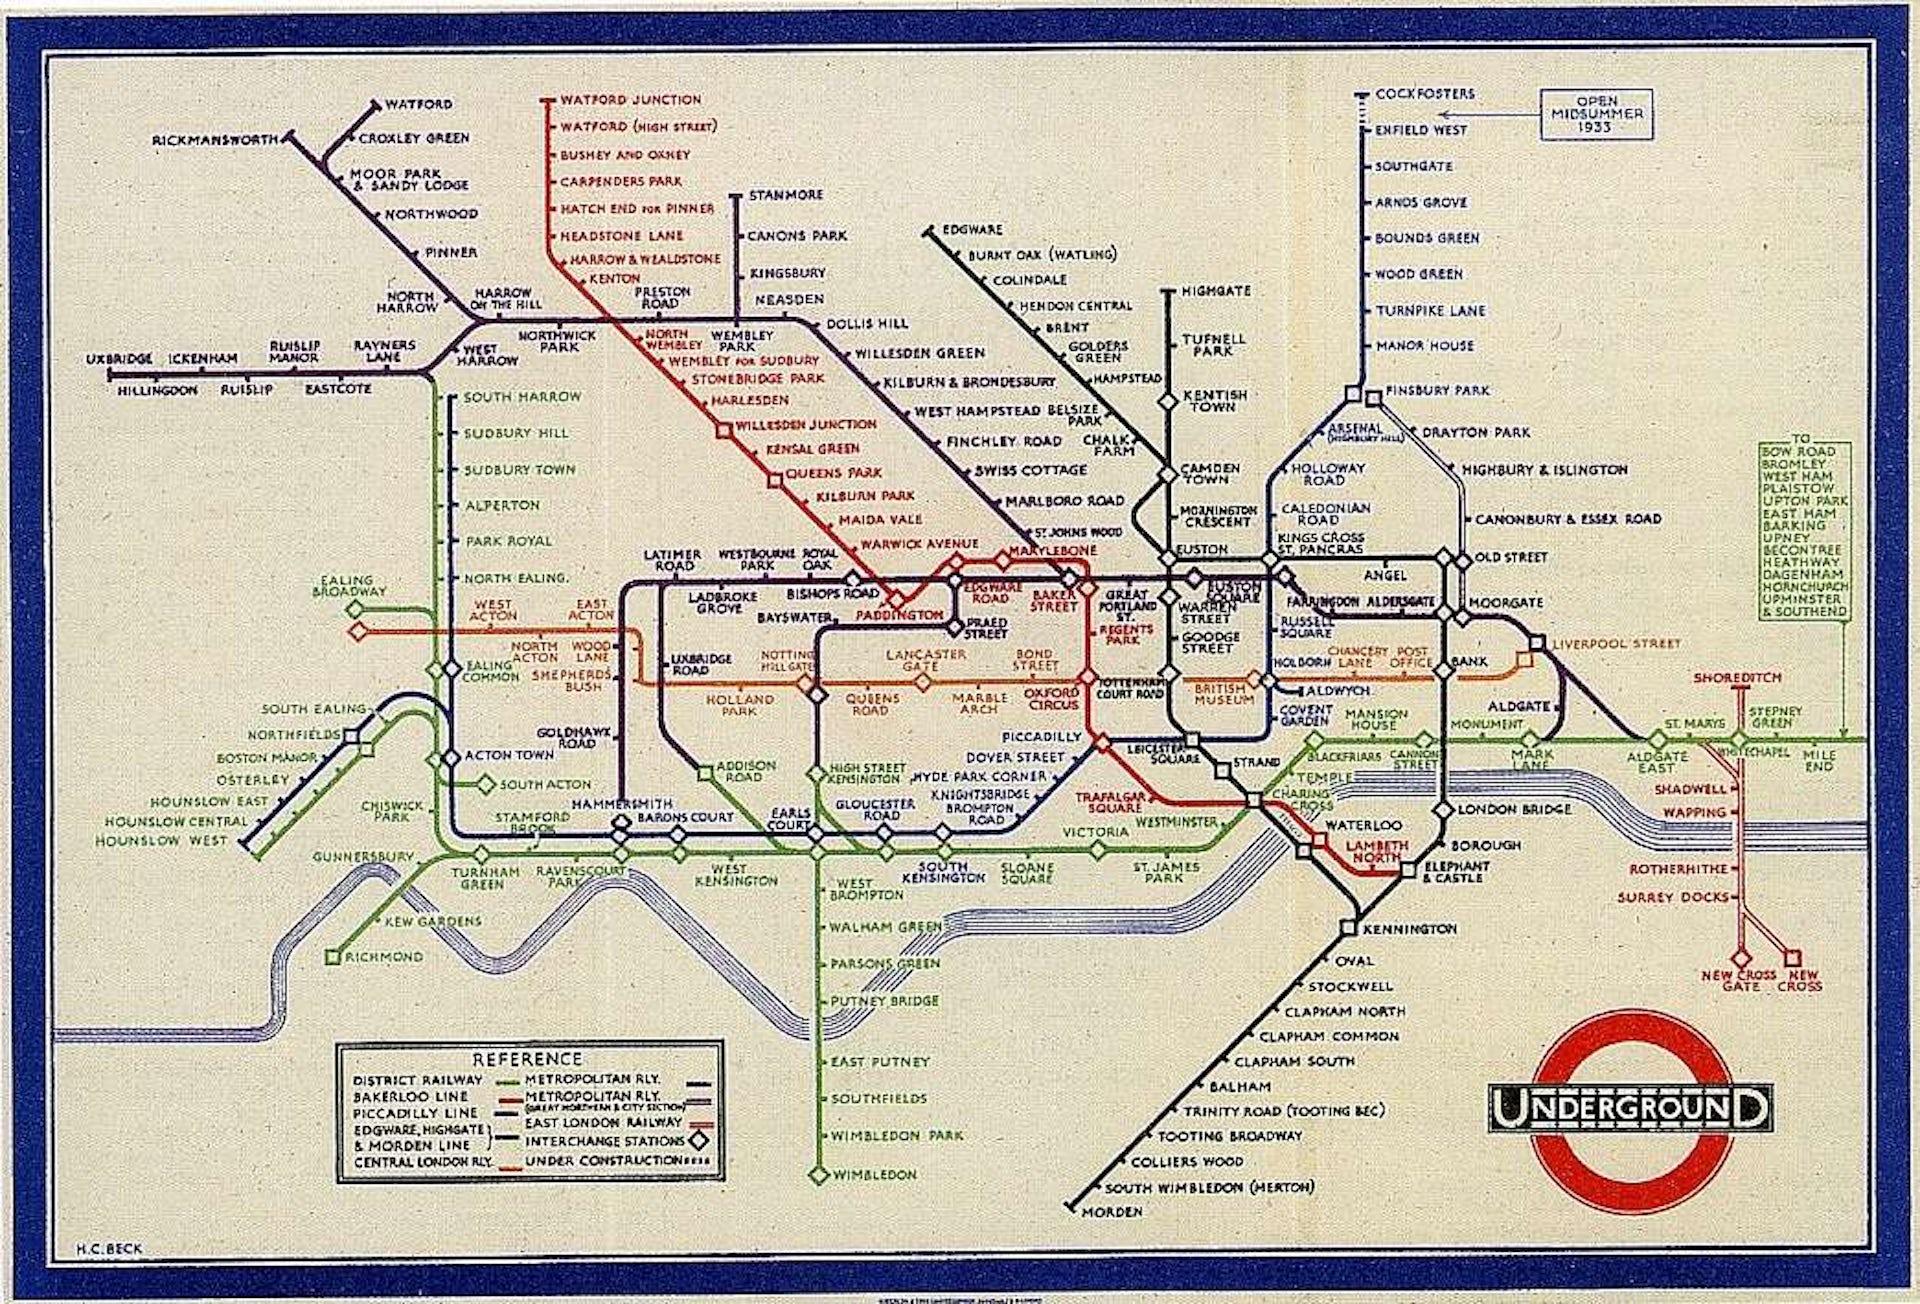 Sublime Design The London Underground Map